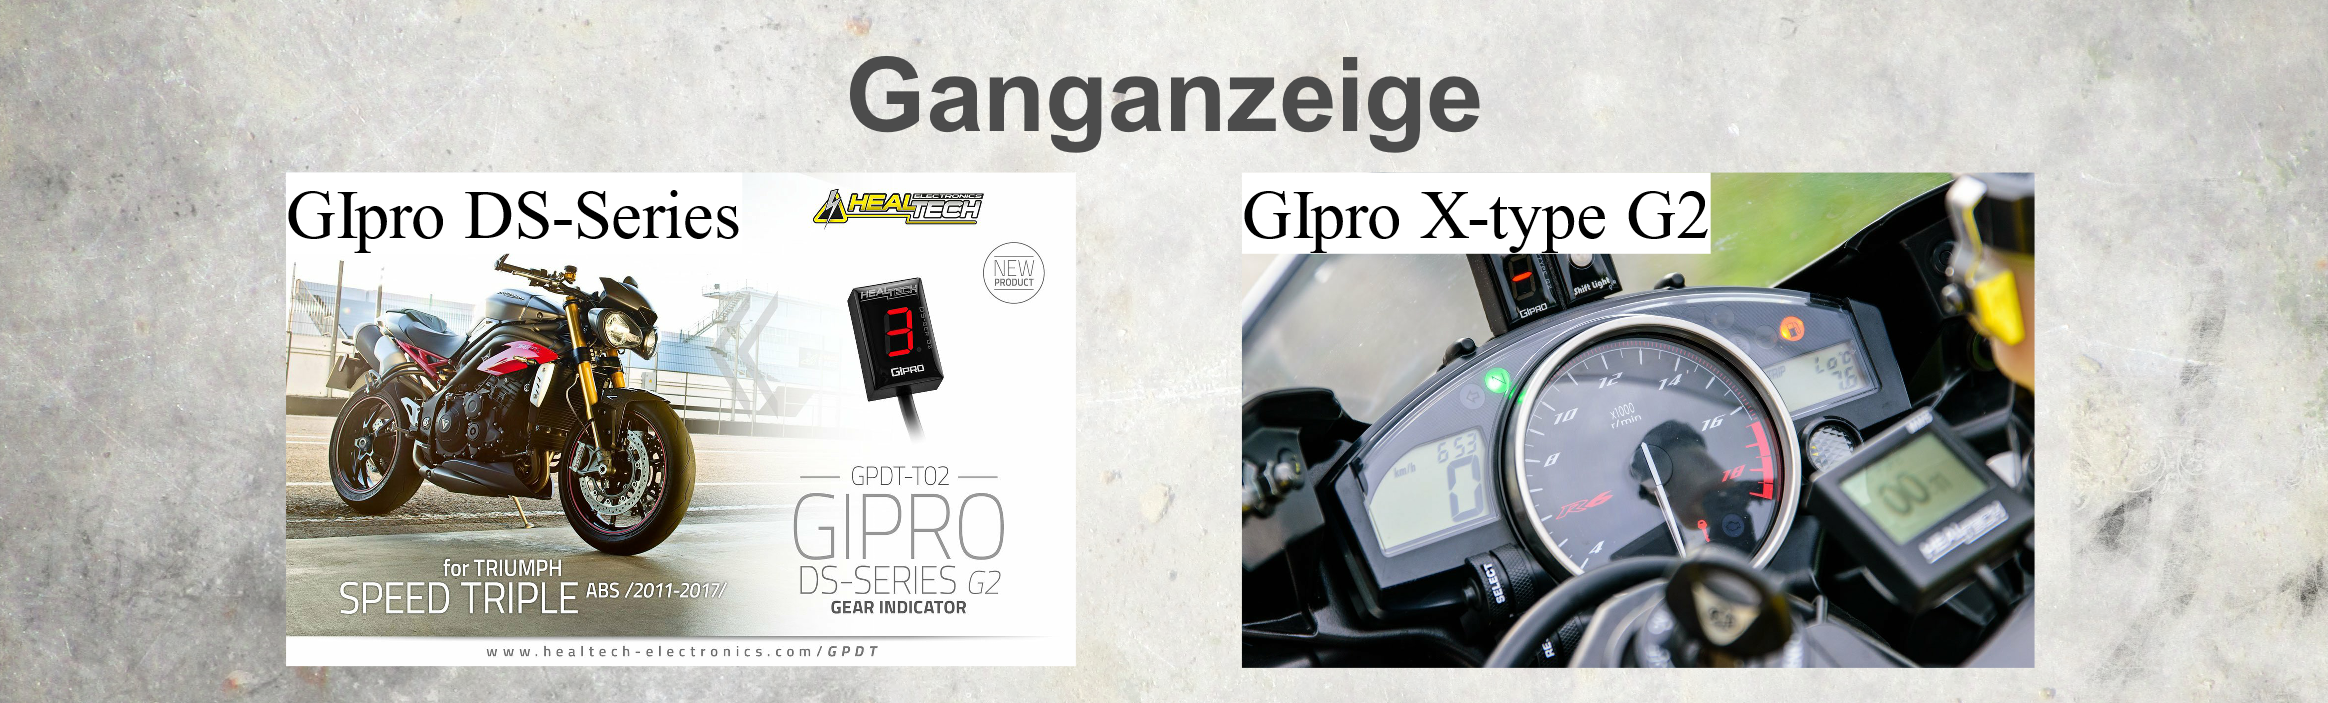 GIpro Ganganzeige